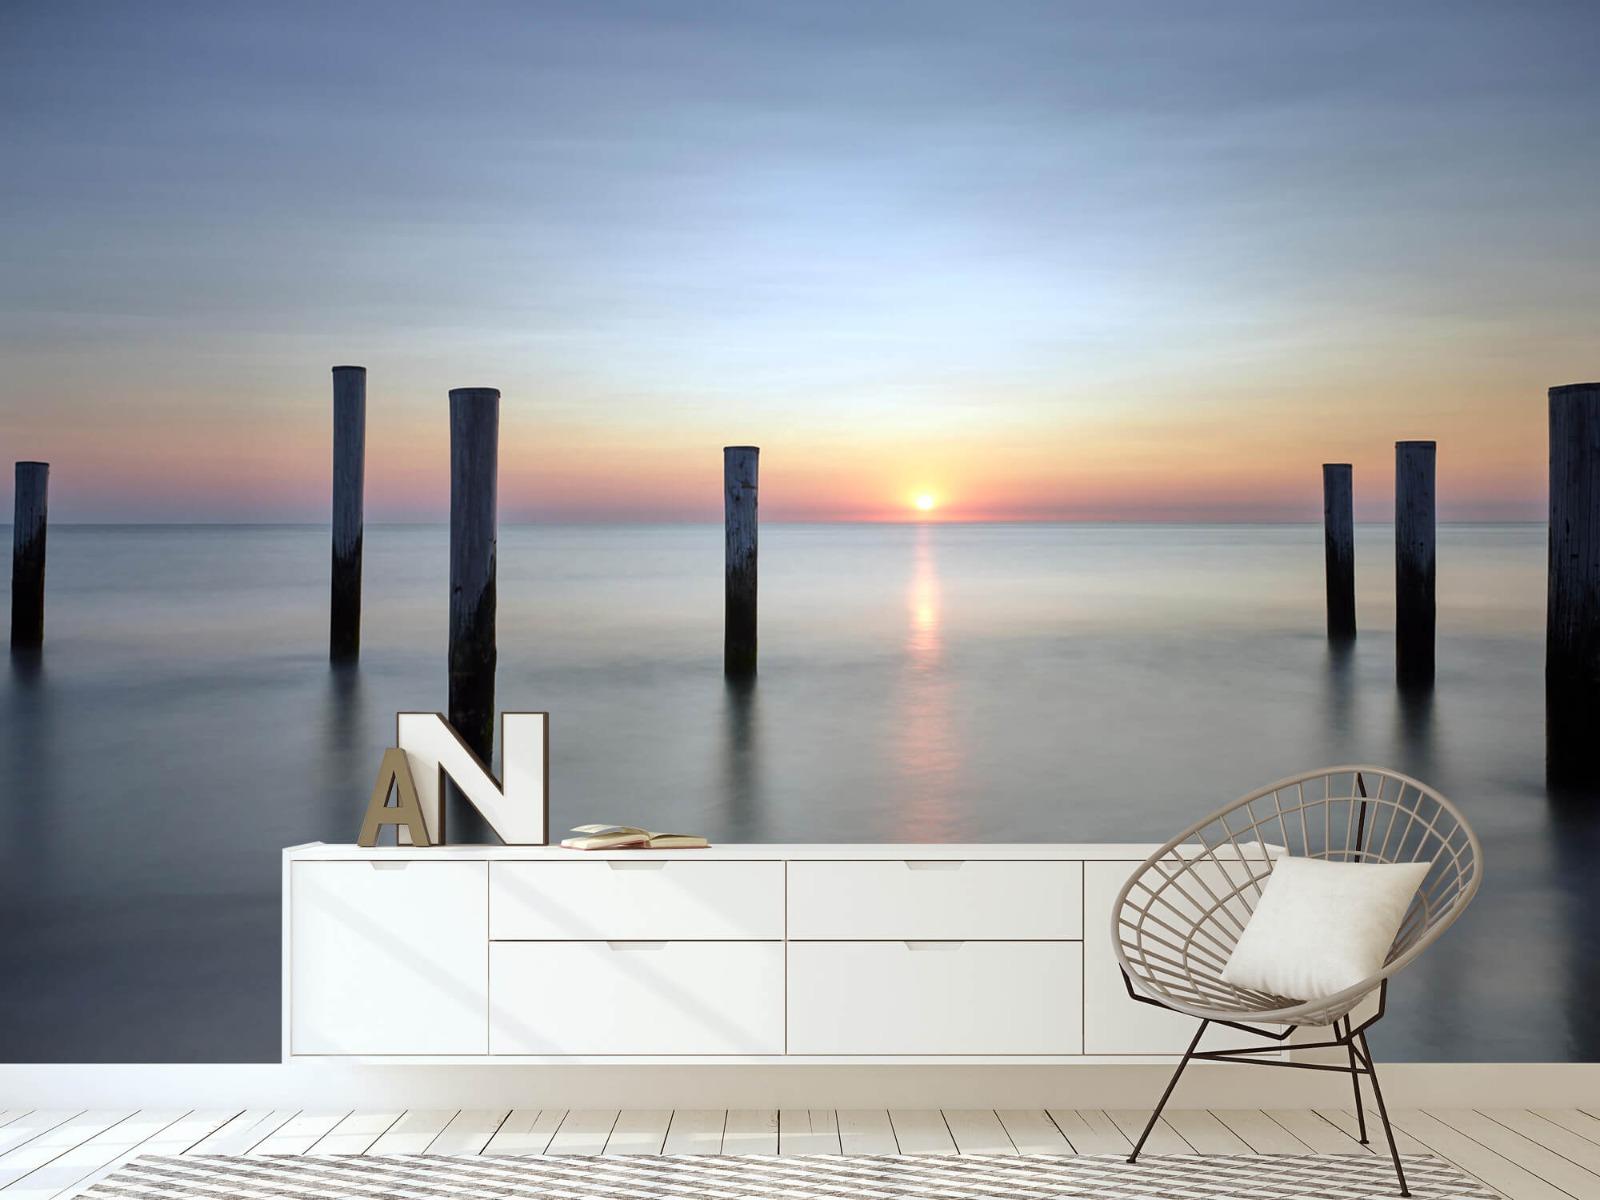 Zeeën en Oceanen - Strandpalen - Slaapkamer 5